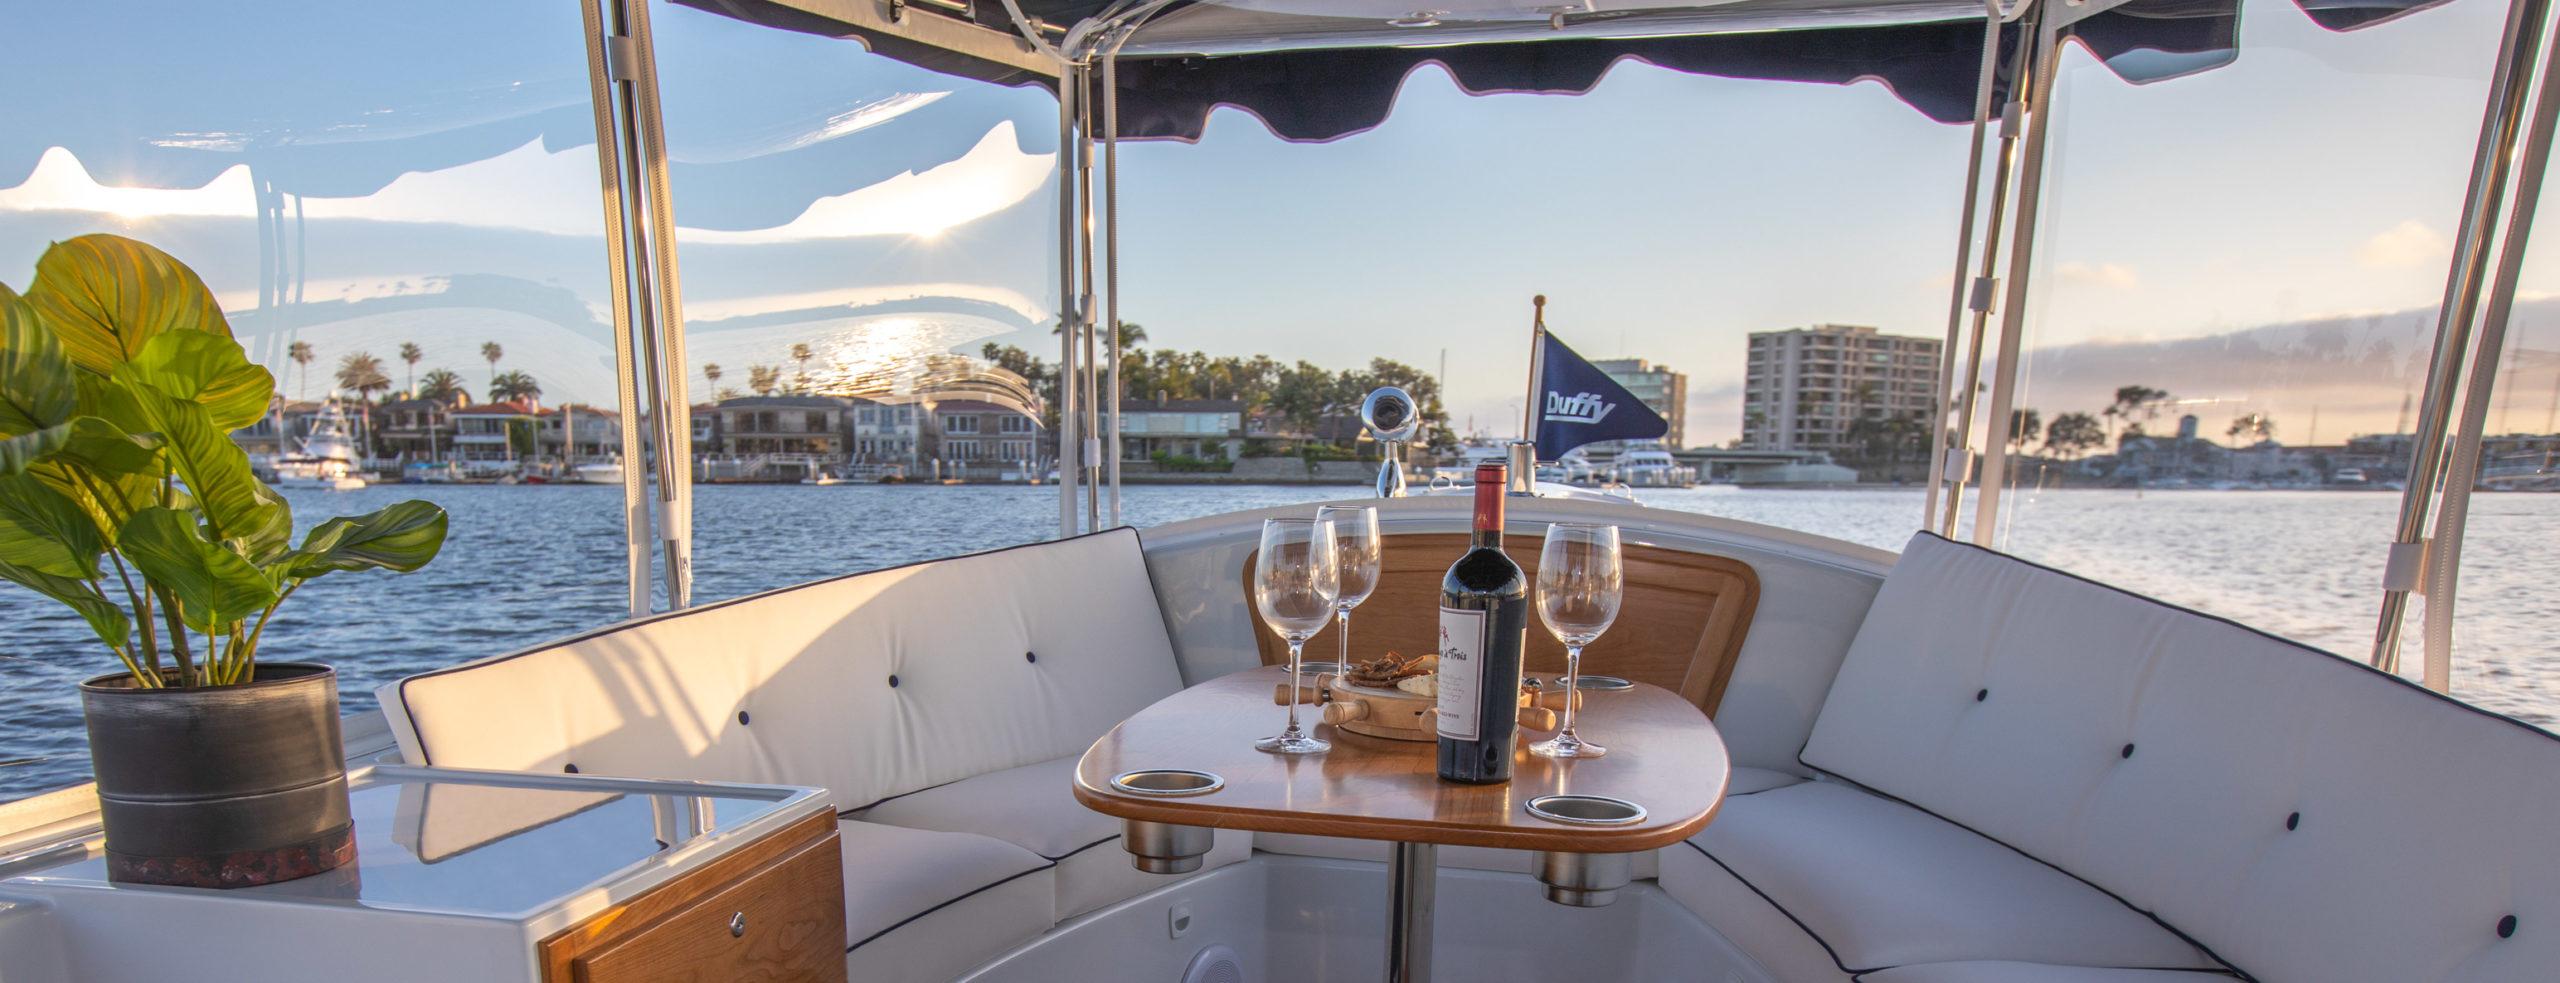 Duffy-Electric-Boats-18-Snug-Harbor-Interior-2020-11